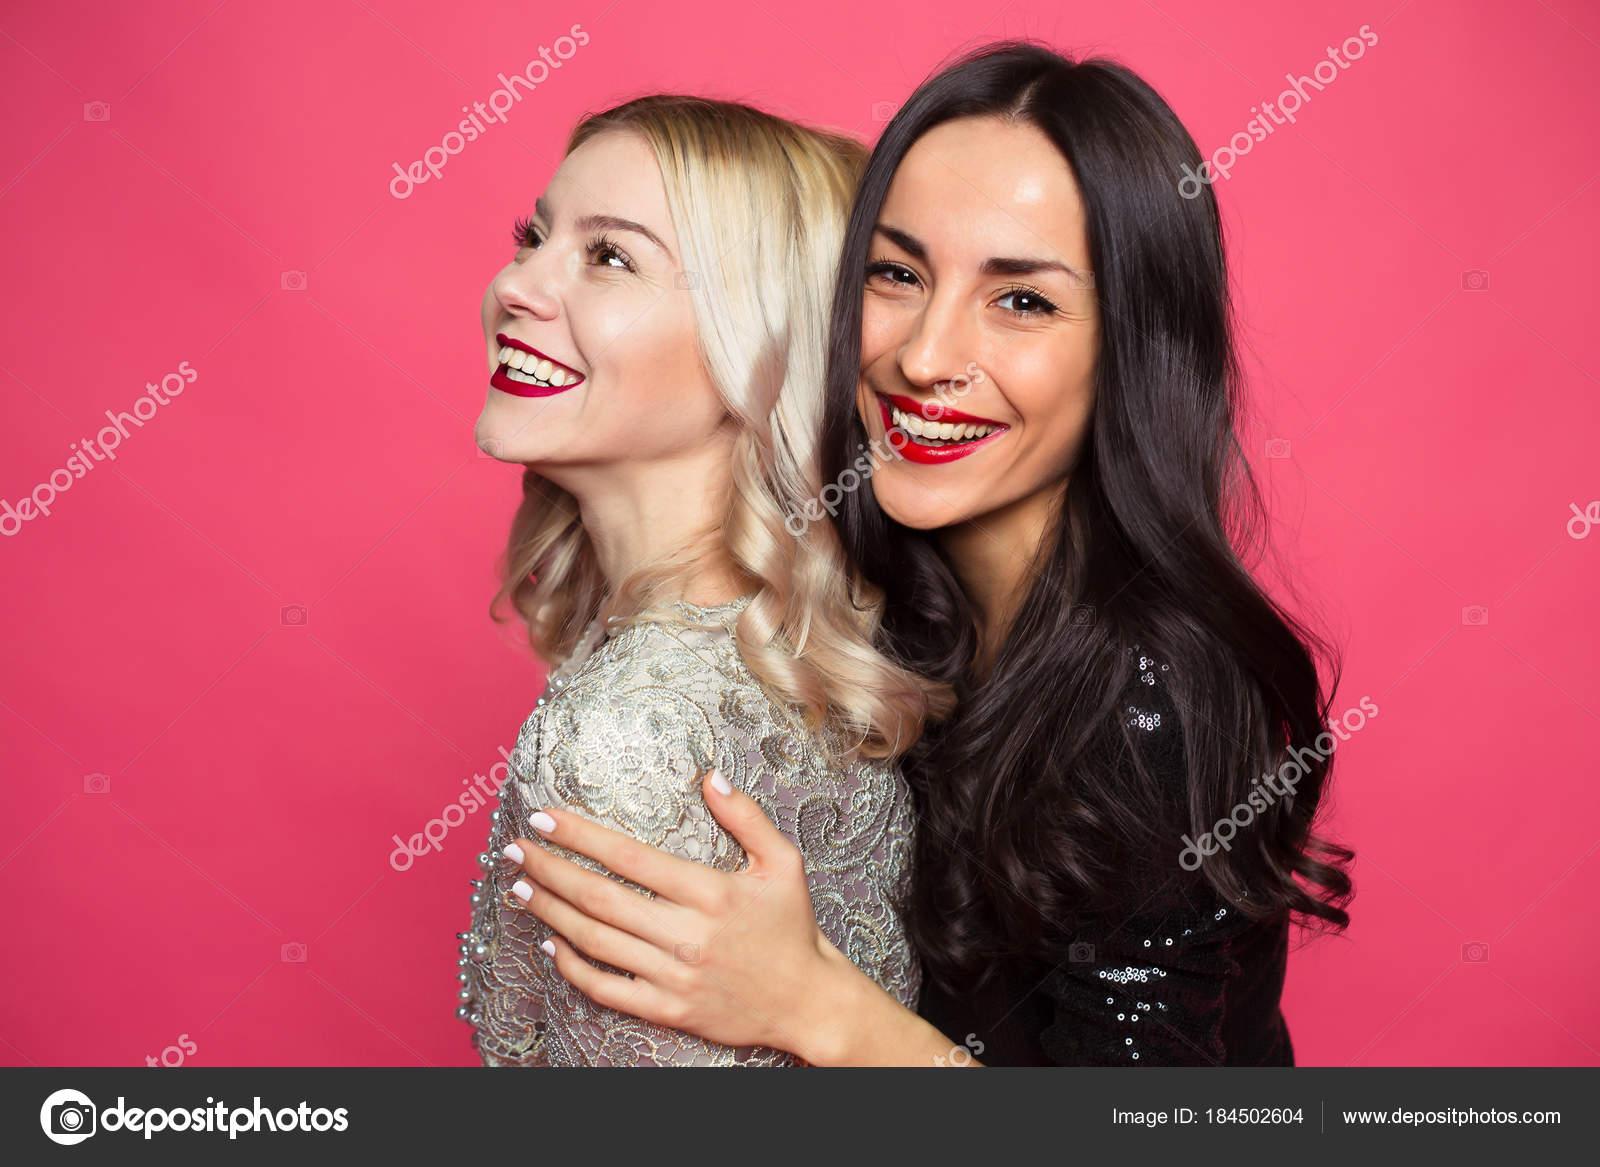 3dfdc8d4059c Εσωτερικη φωτογραφία των δύο νέων ευτυχής όμορφη χαμογελώντας φίλες σε μικρά  μαύρα φορέματα που παρουσιάζουν και τη διασκέδαση σε ροζ φόντο — Εικόνα από  ...